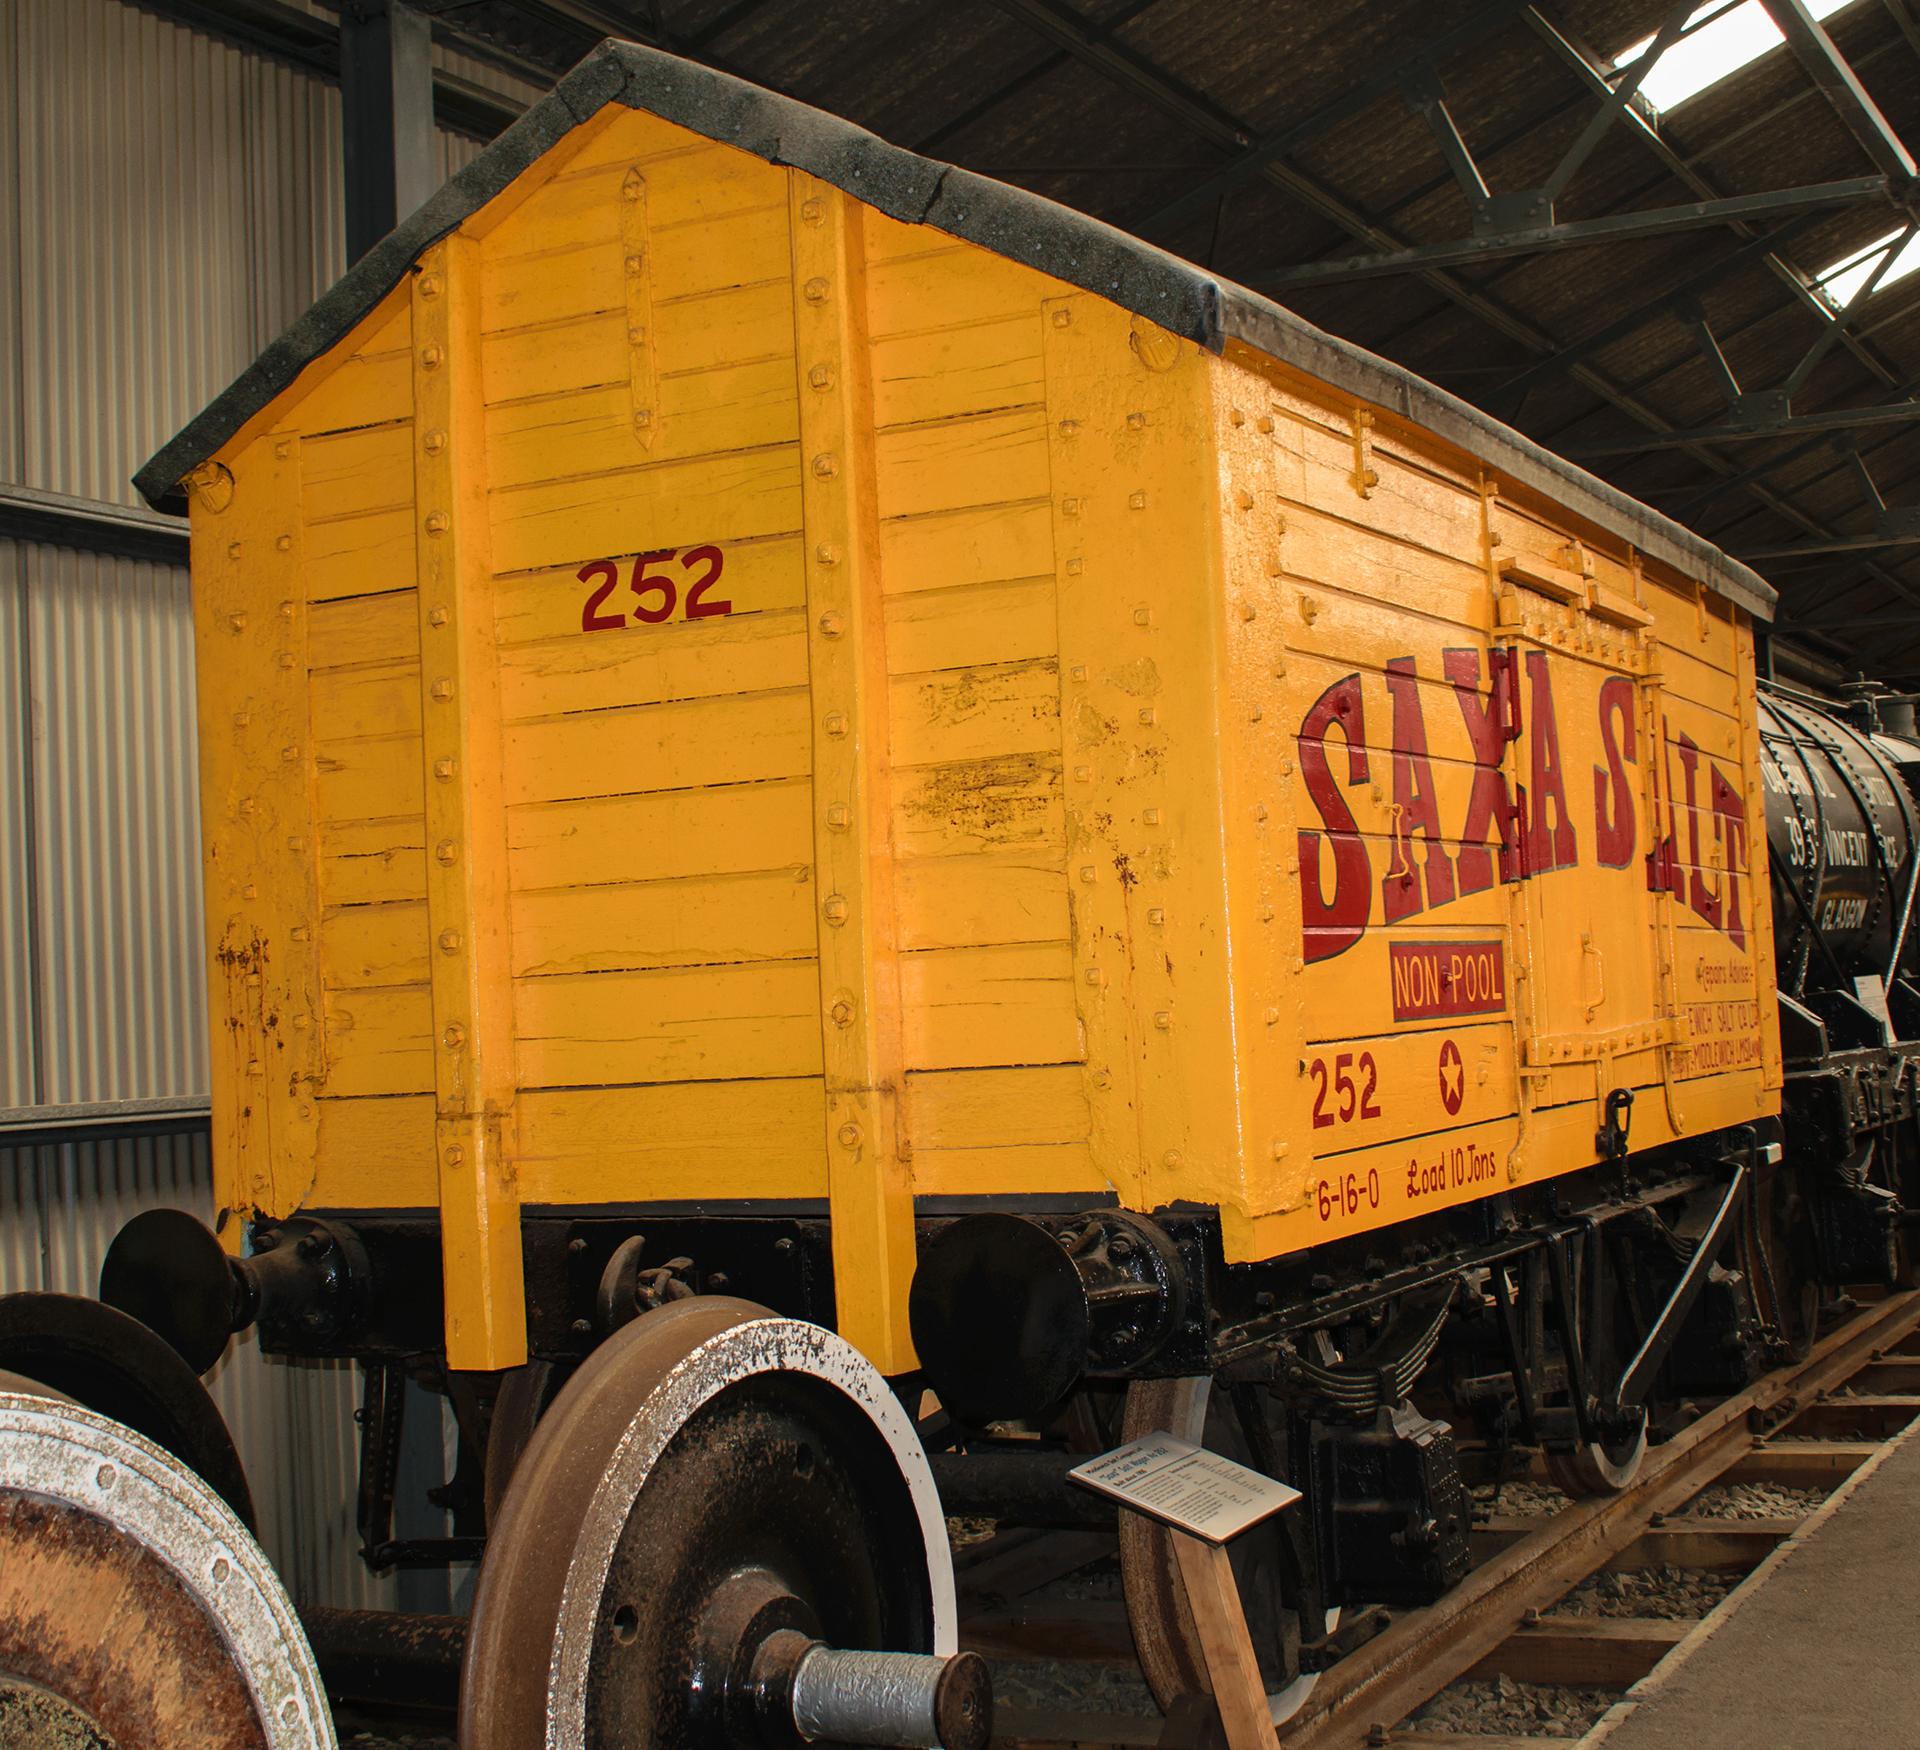 No. 252 Saxa Salt van at the Bo'ness & Kinneil Railway in May 2018. ©Dan Adkins